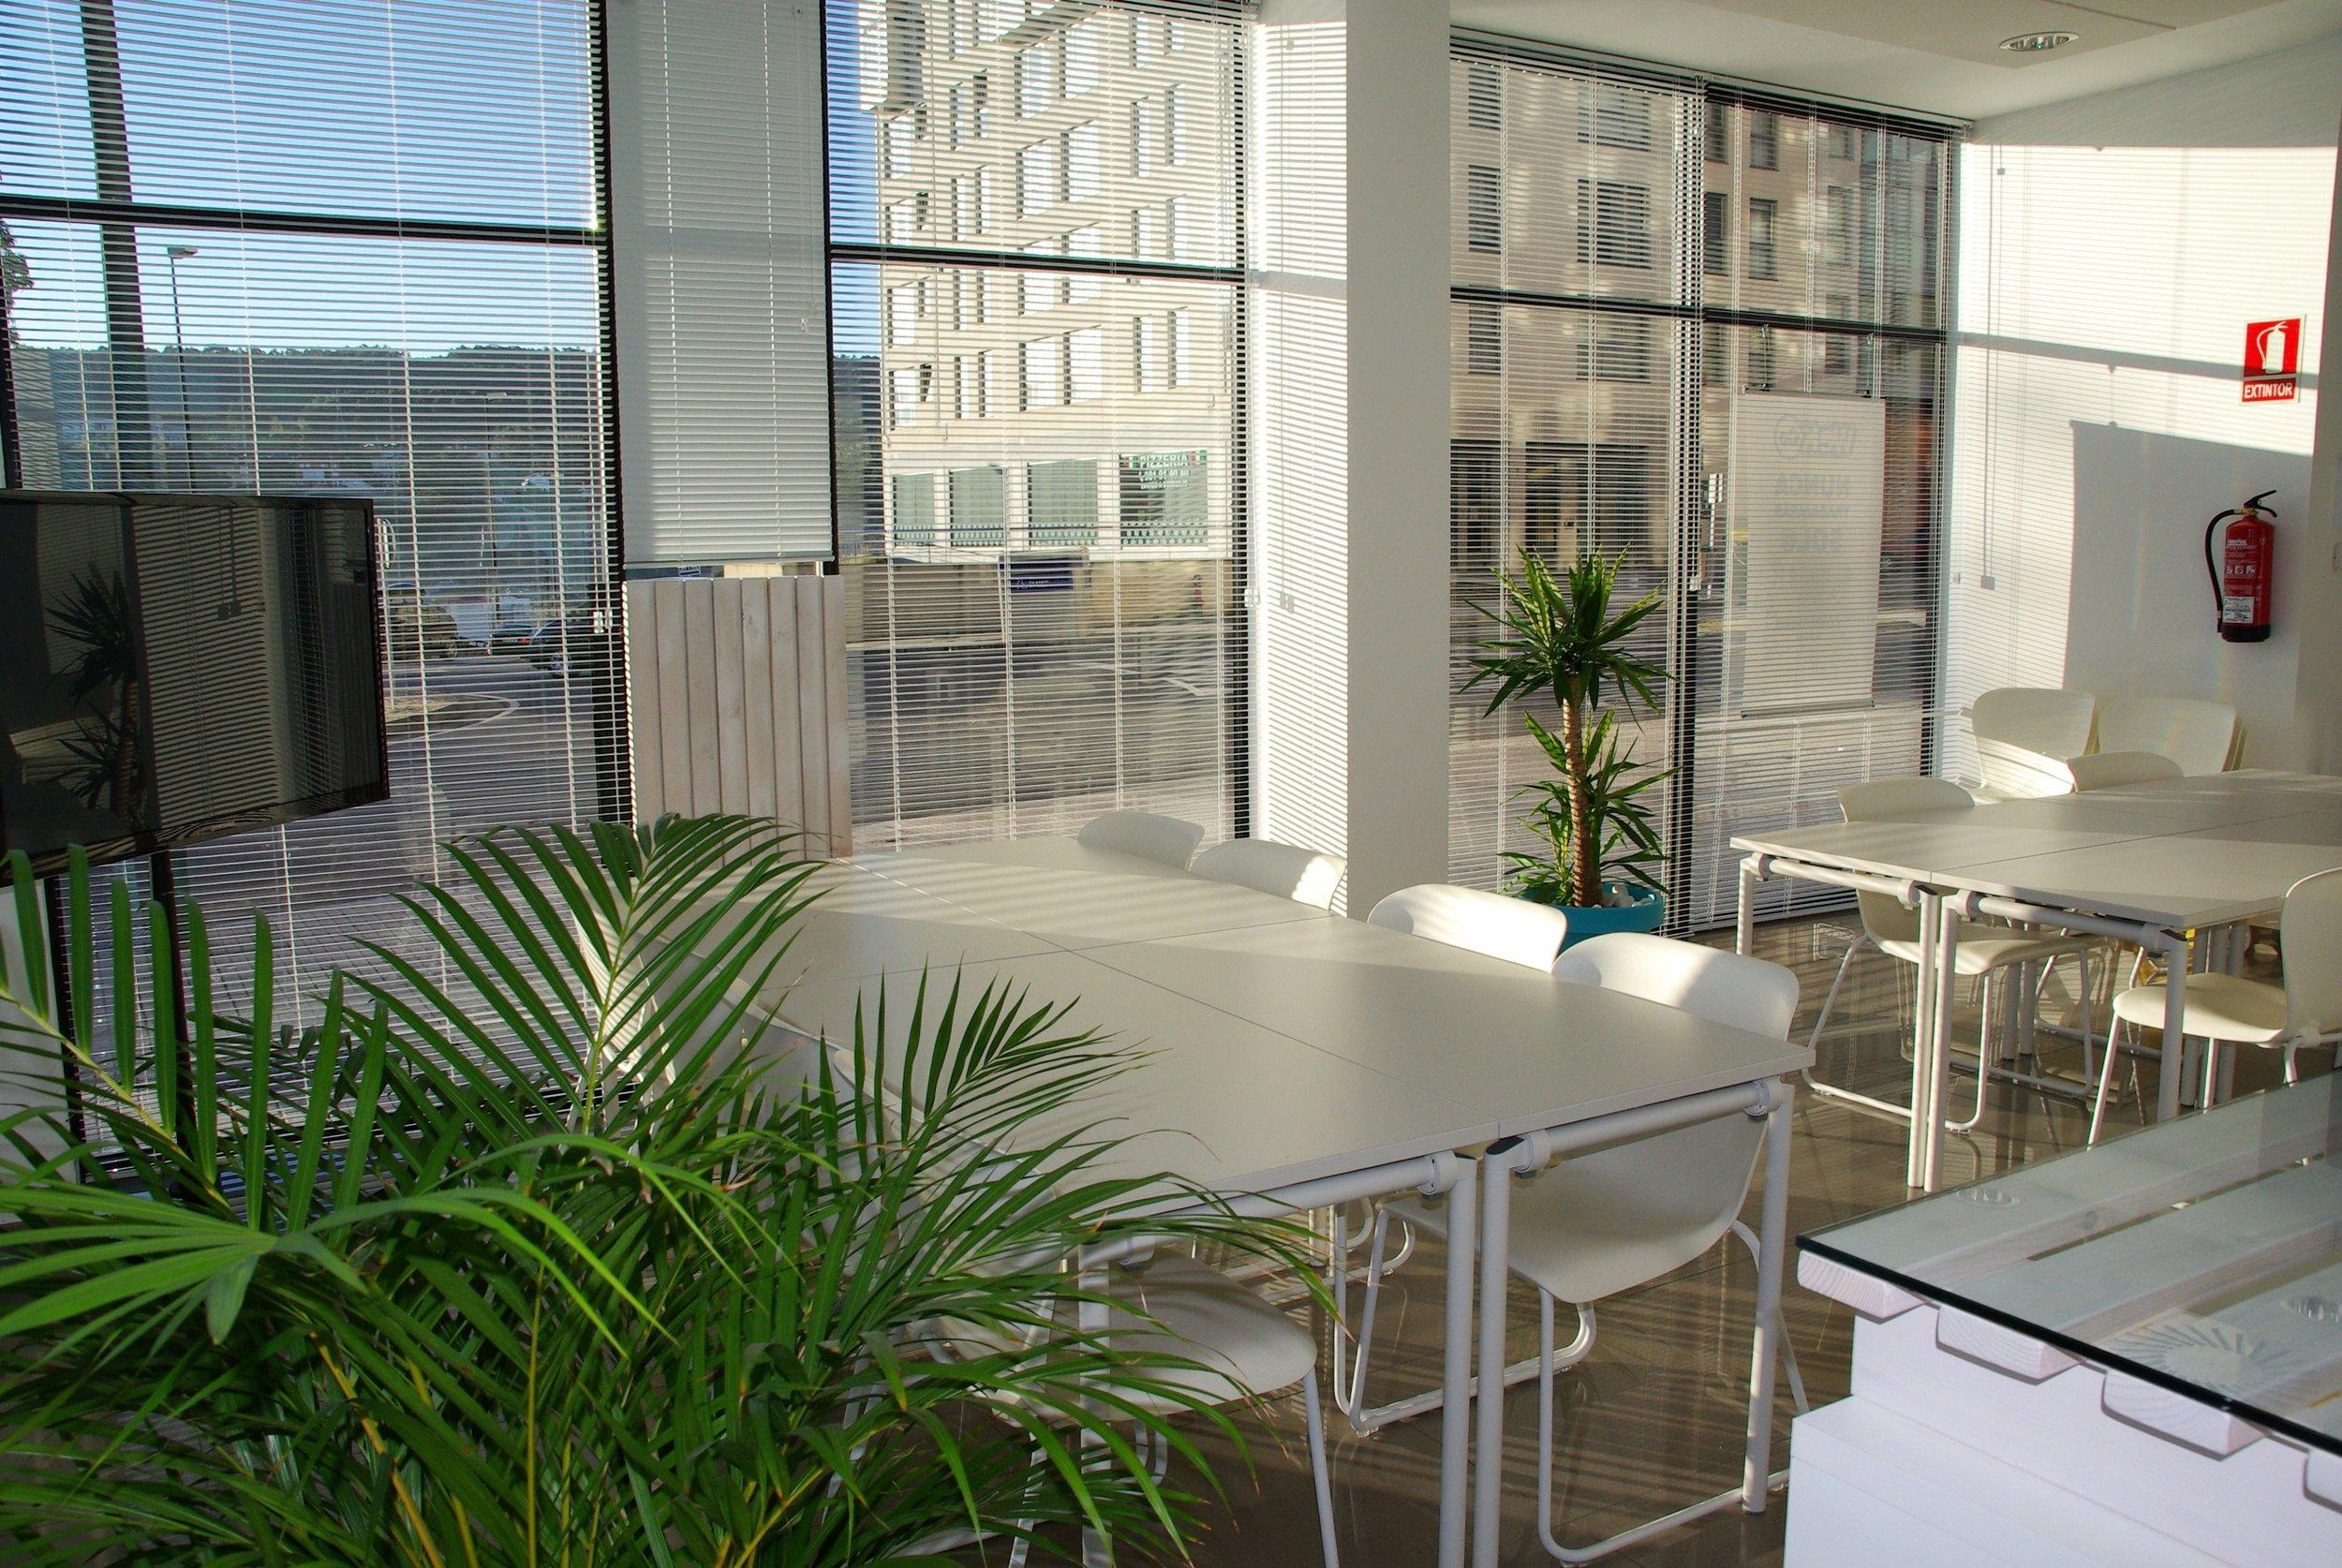 apartment-architecture-chair-221537.jpg